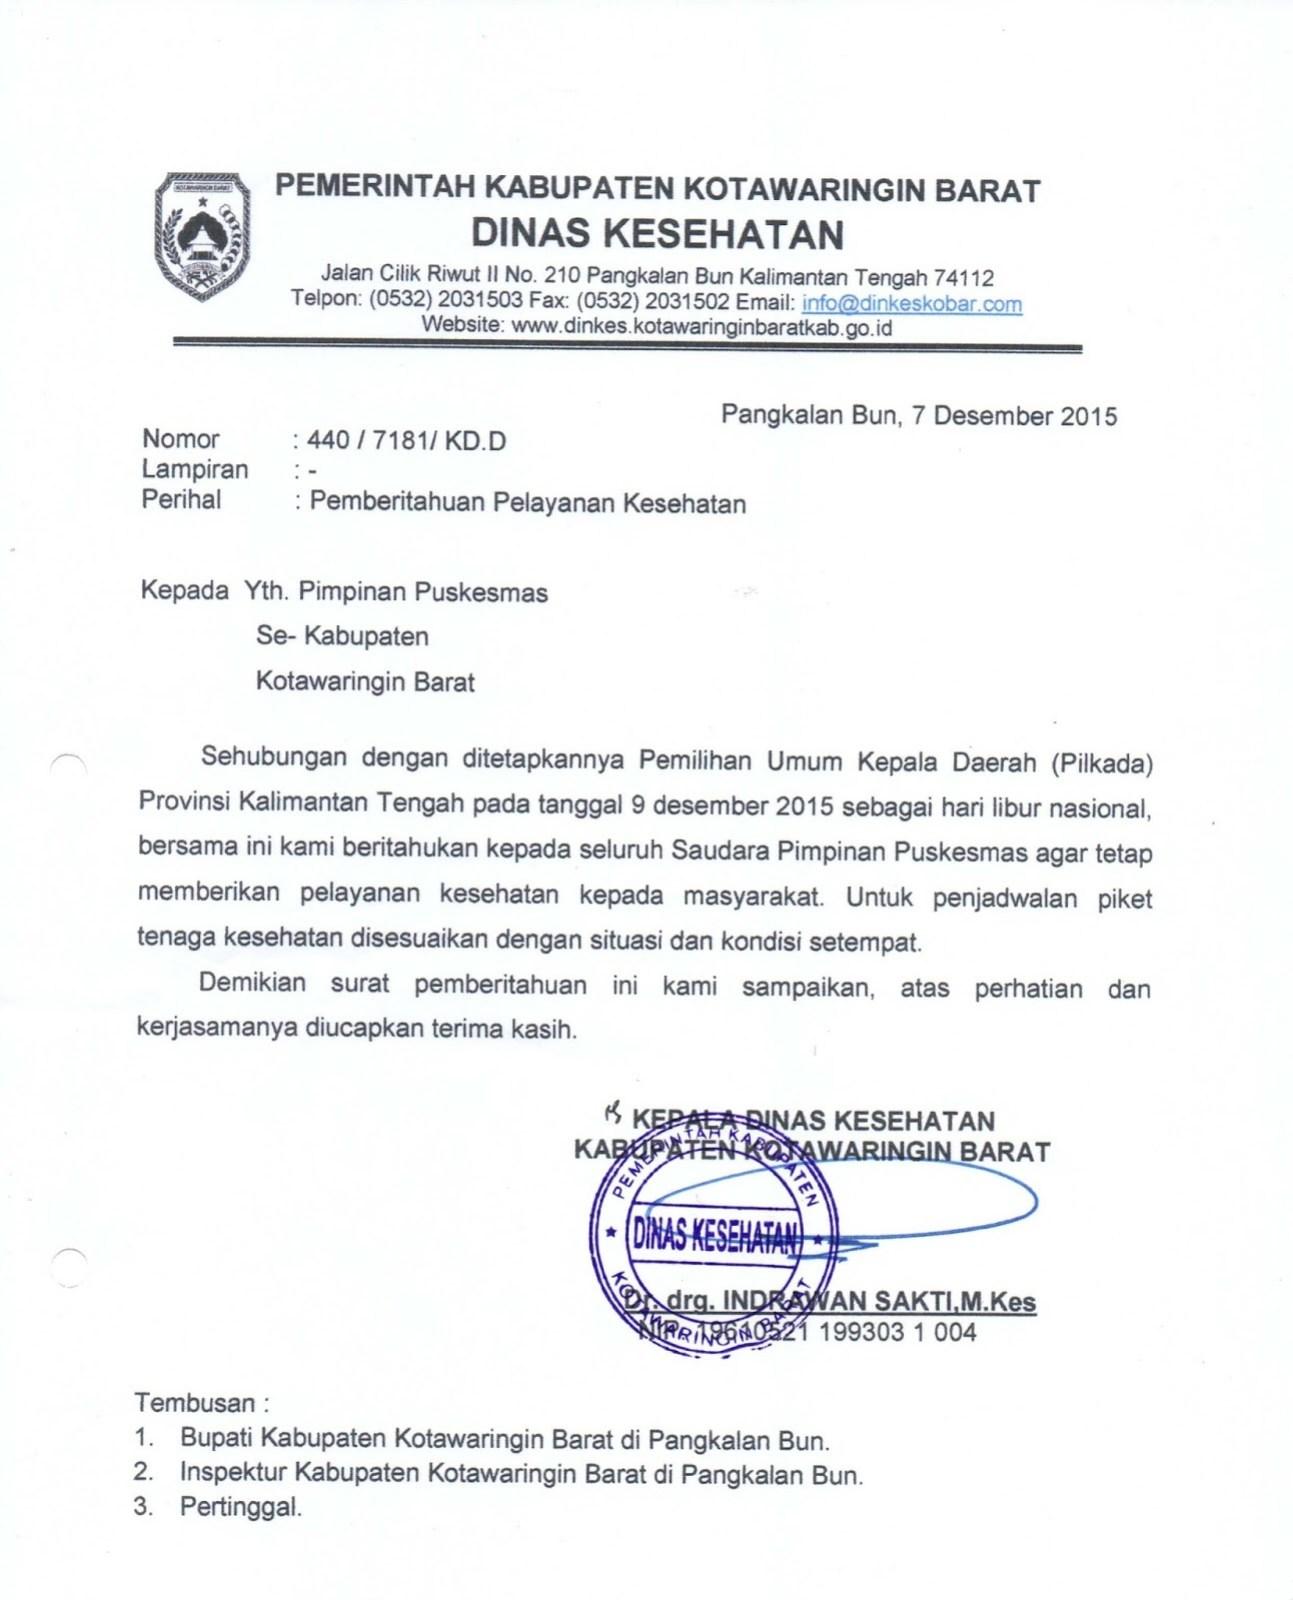 Contoh Surat Pemberitahuan Dinas